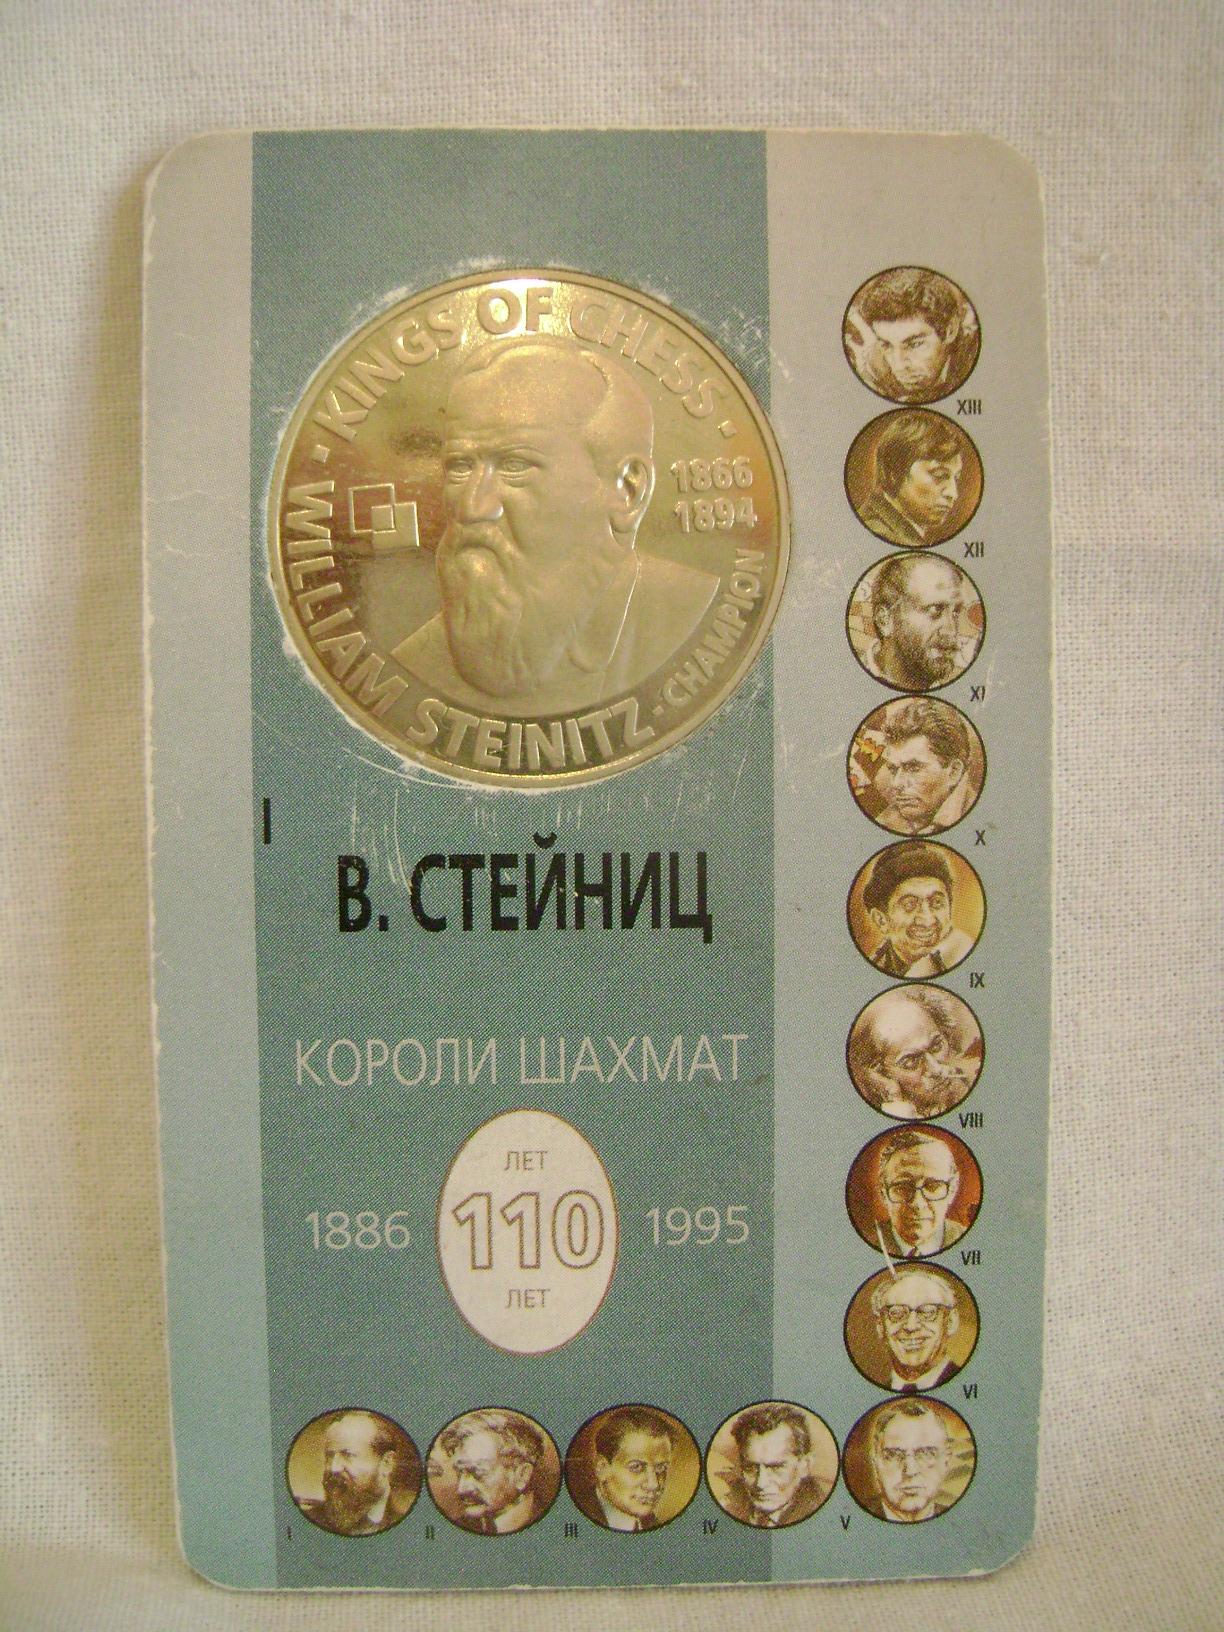 Coin_William_Steinitz_Kralj_saha__1.JPG